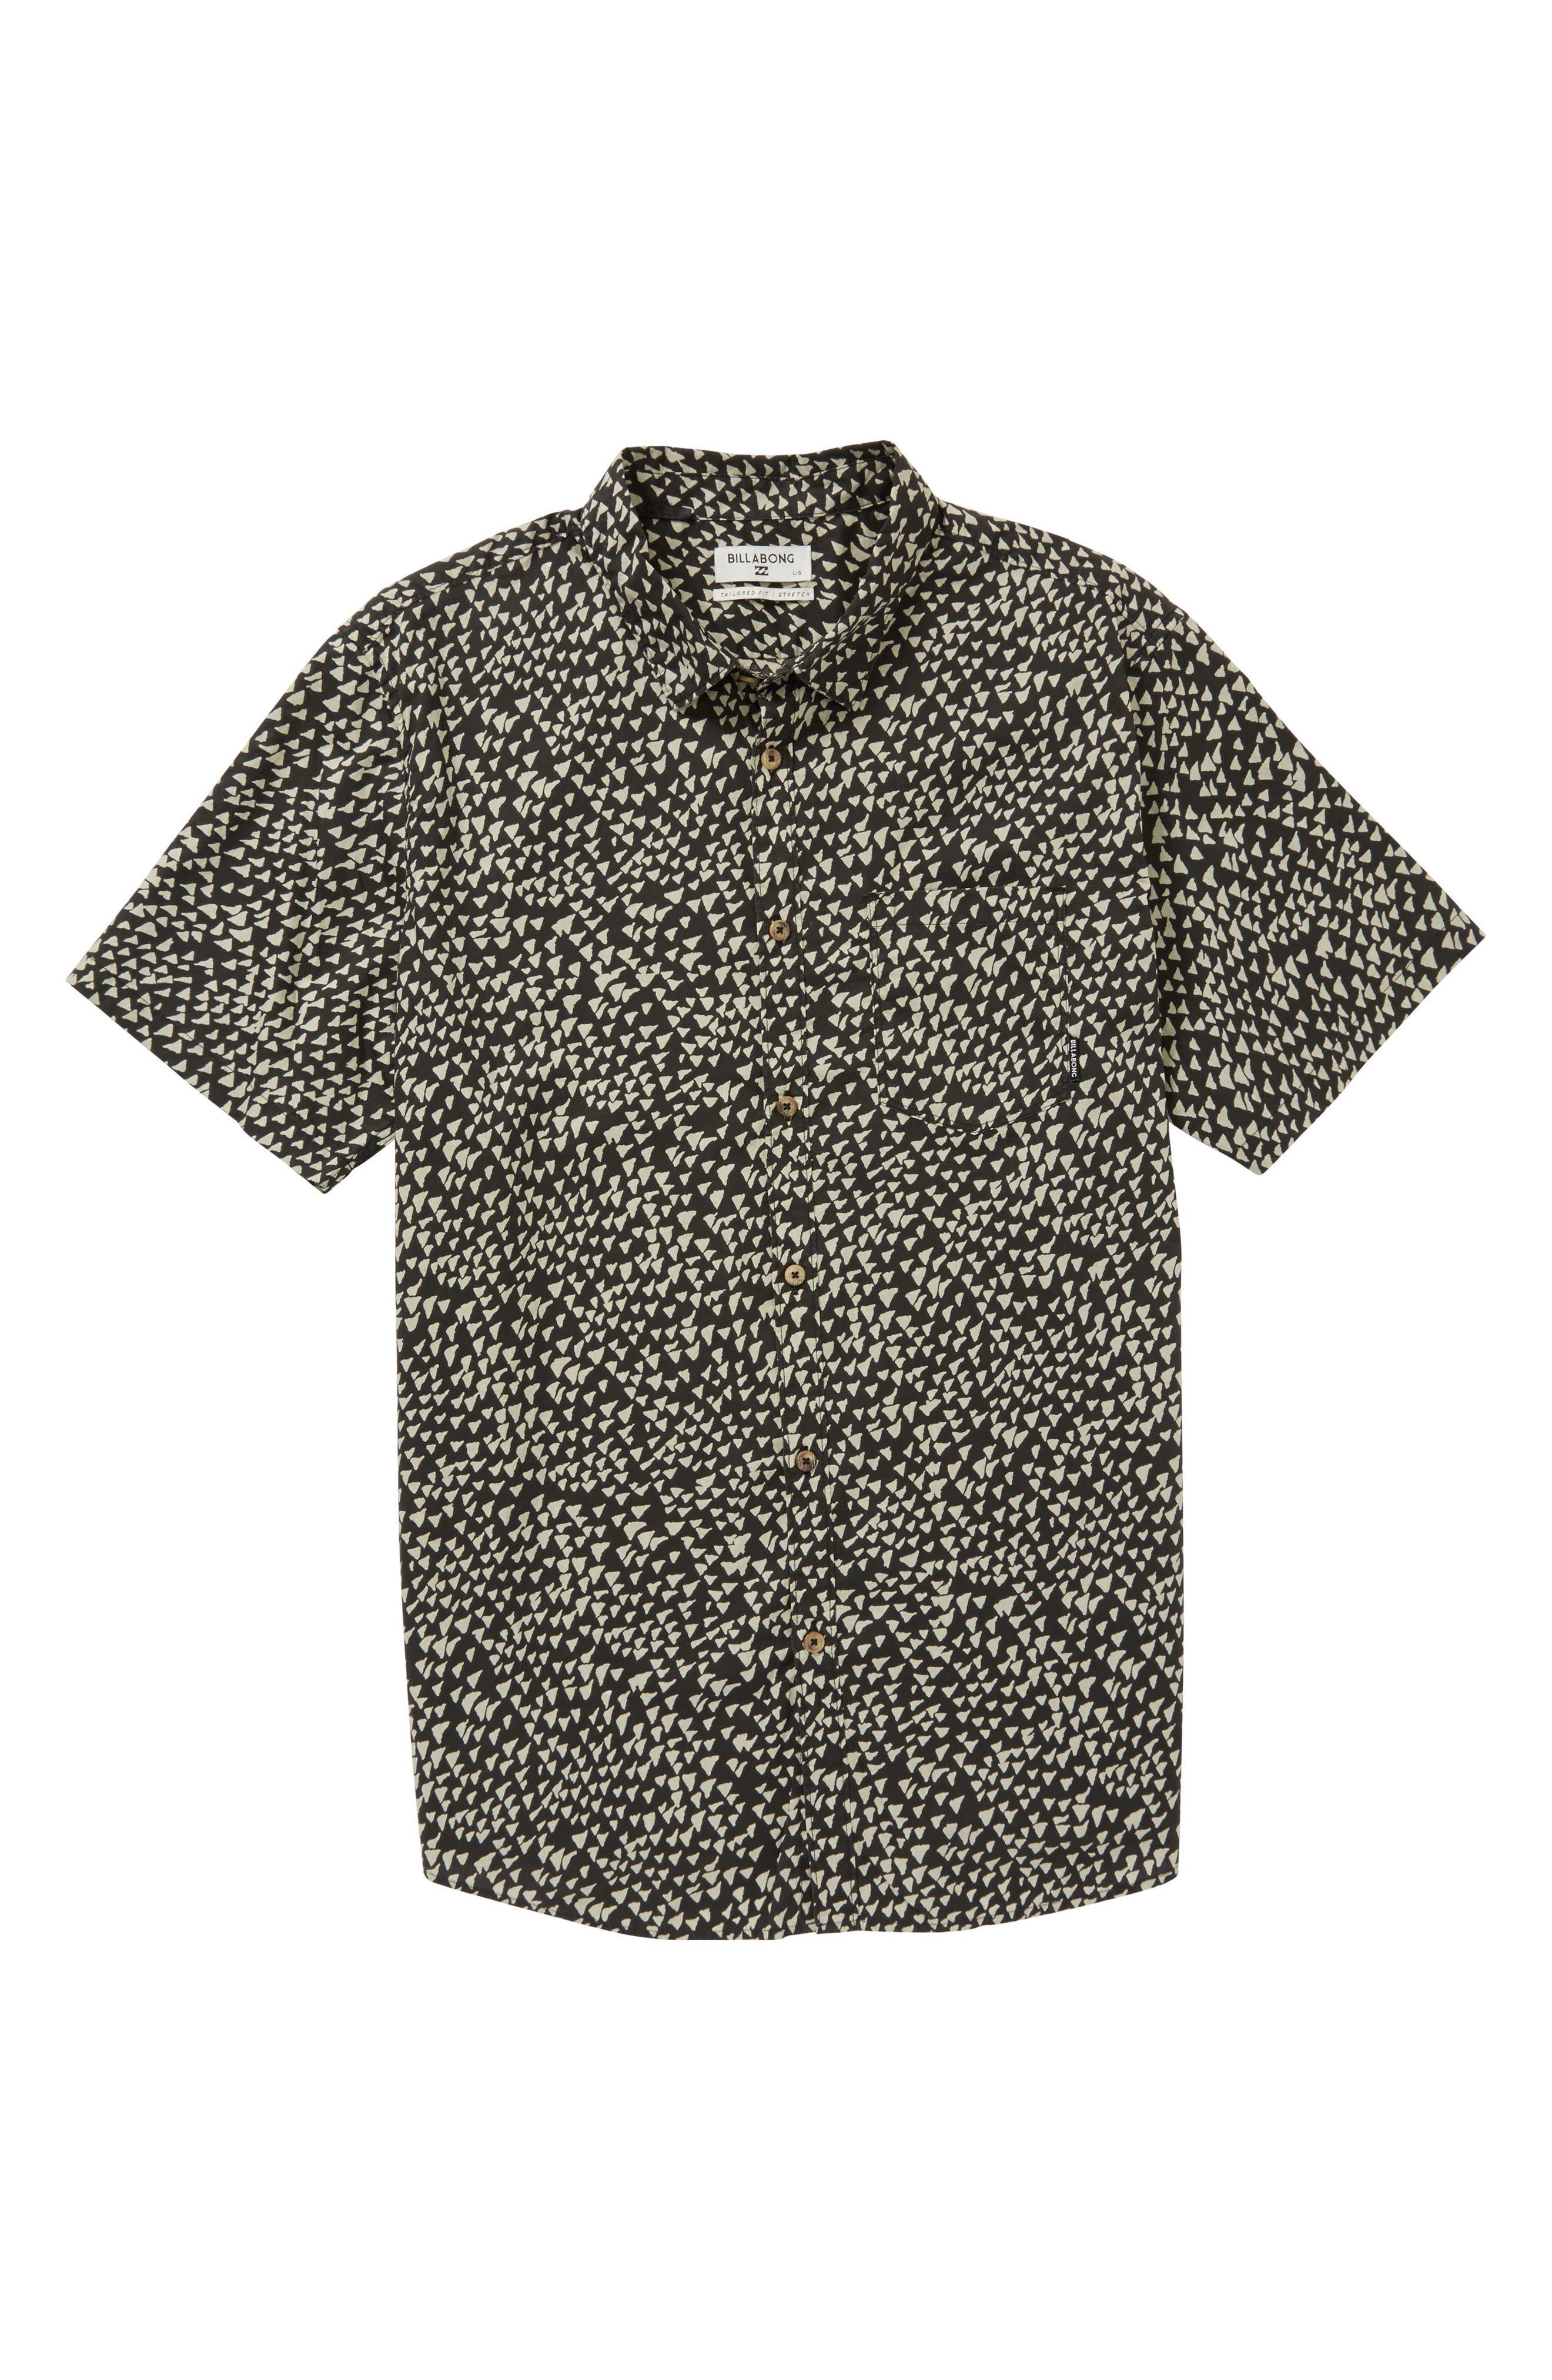 Main Image - Billabong Sundays Woven Shirt (Little Boys)